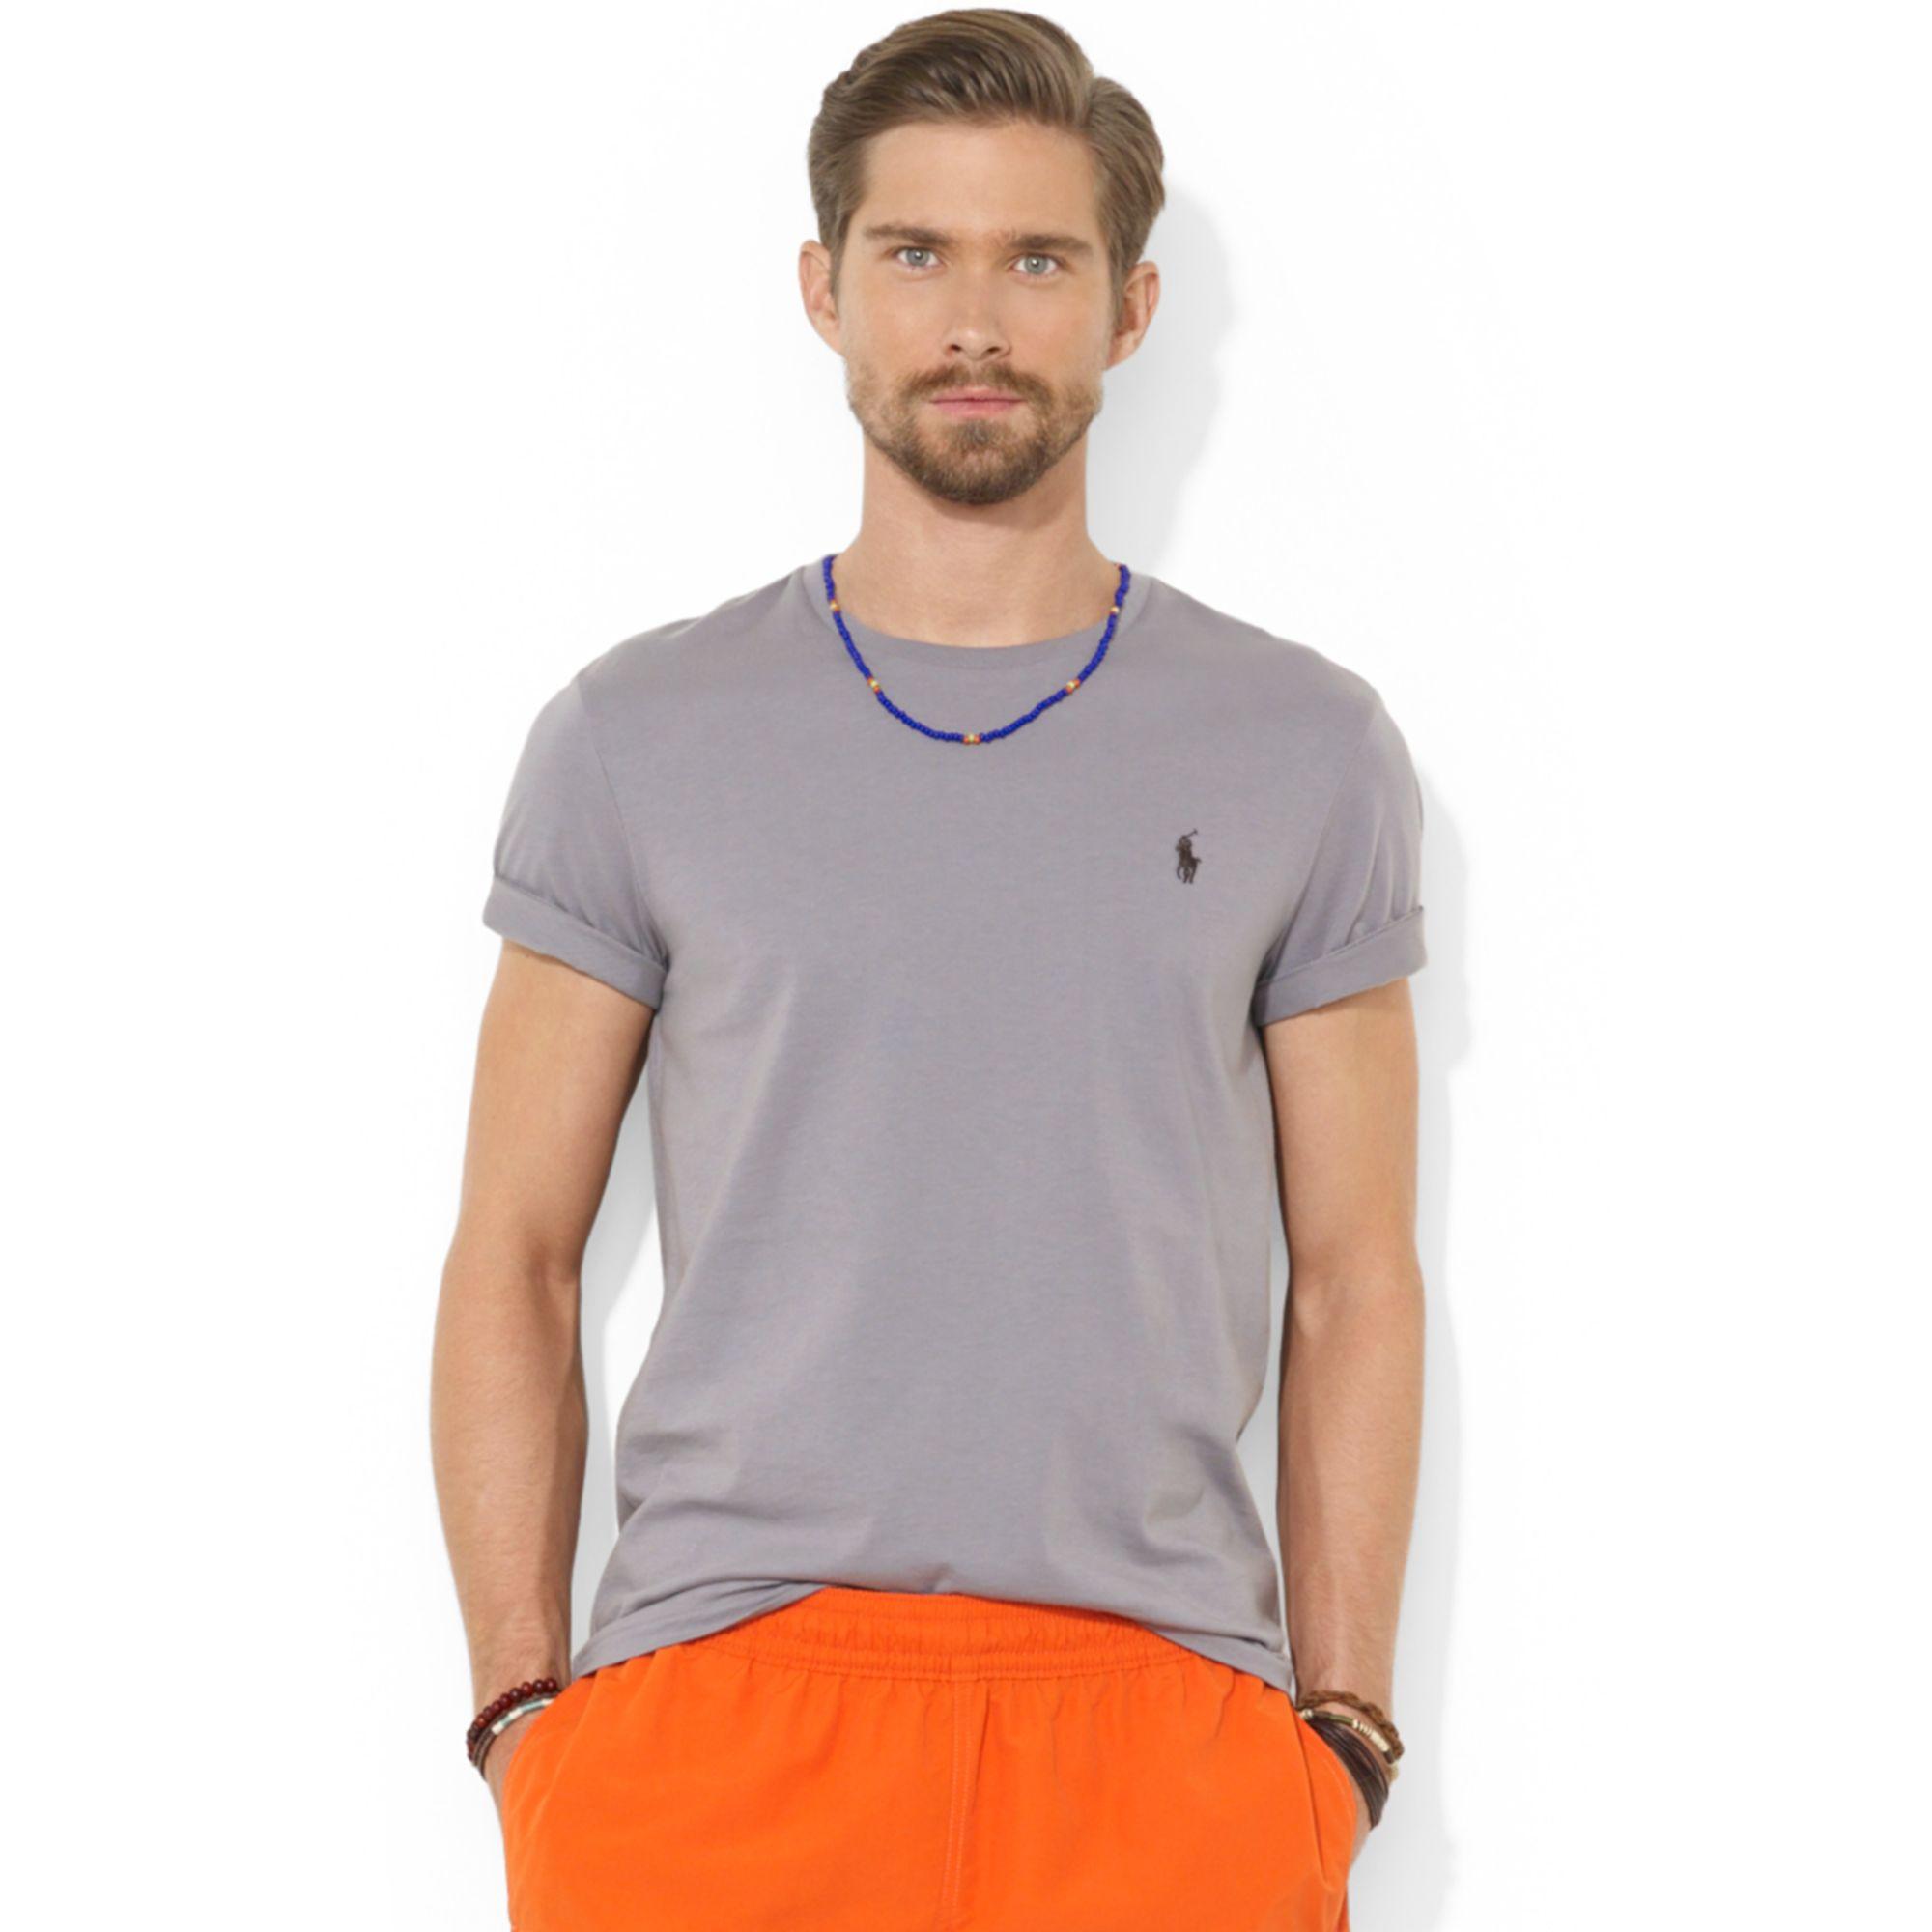 Polo Customfit Cotton Jersey T Shirt